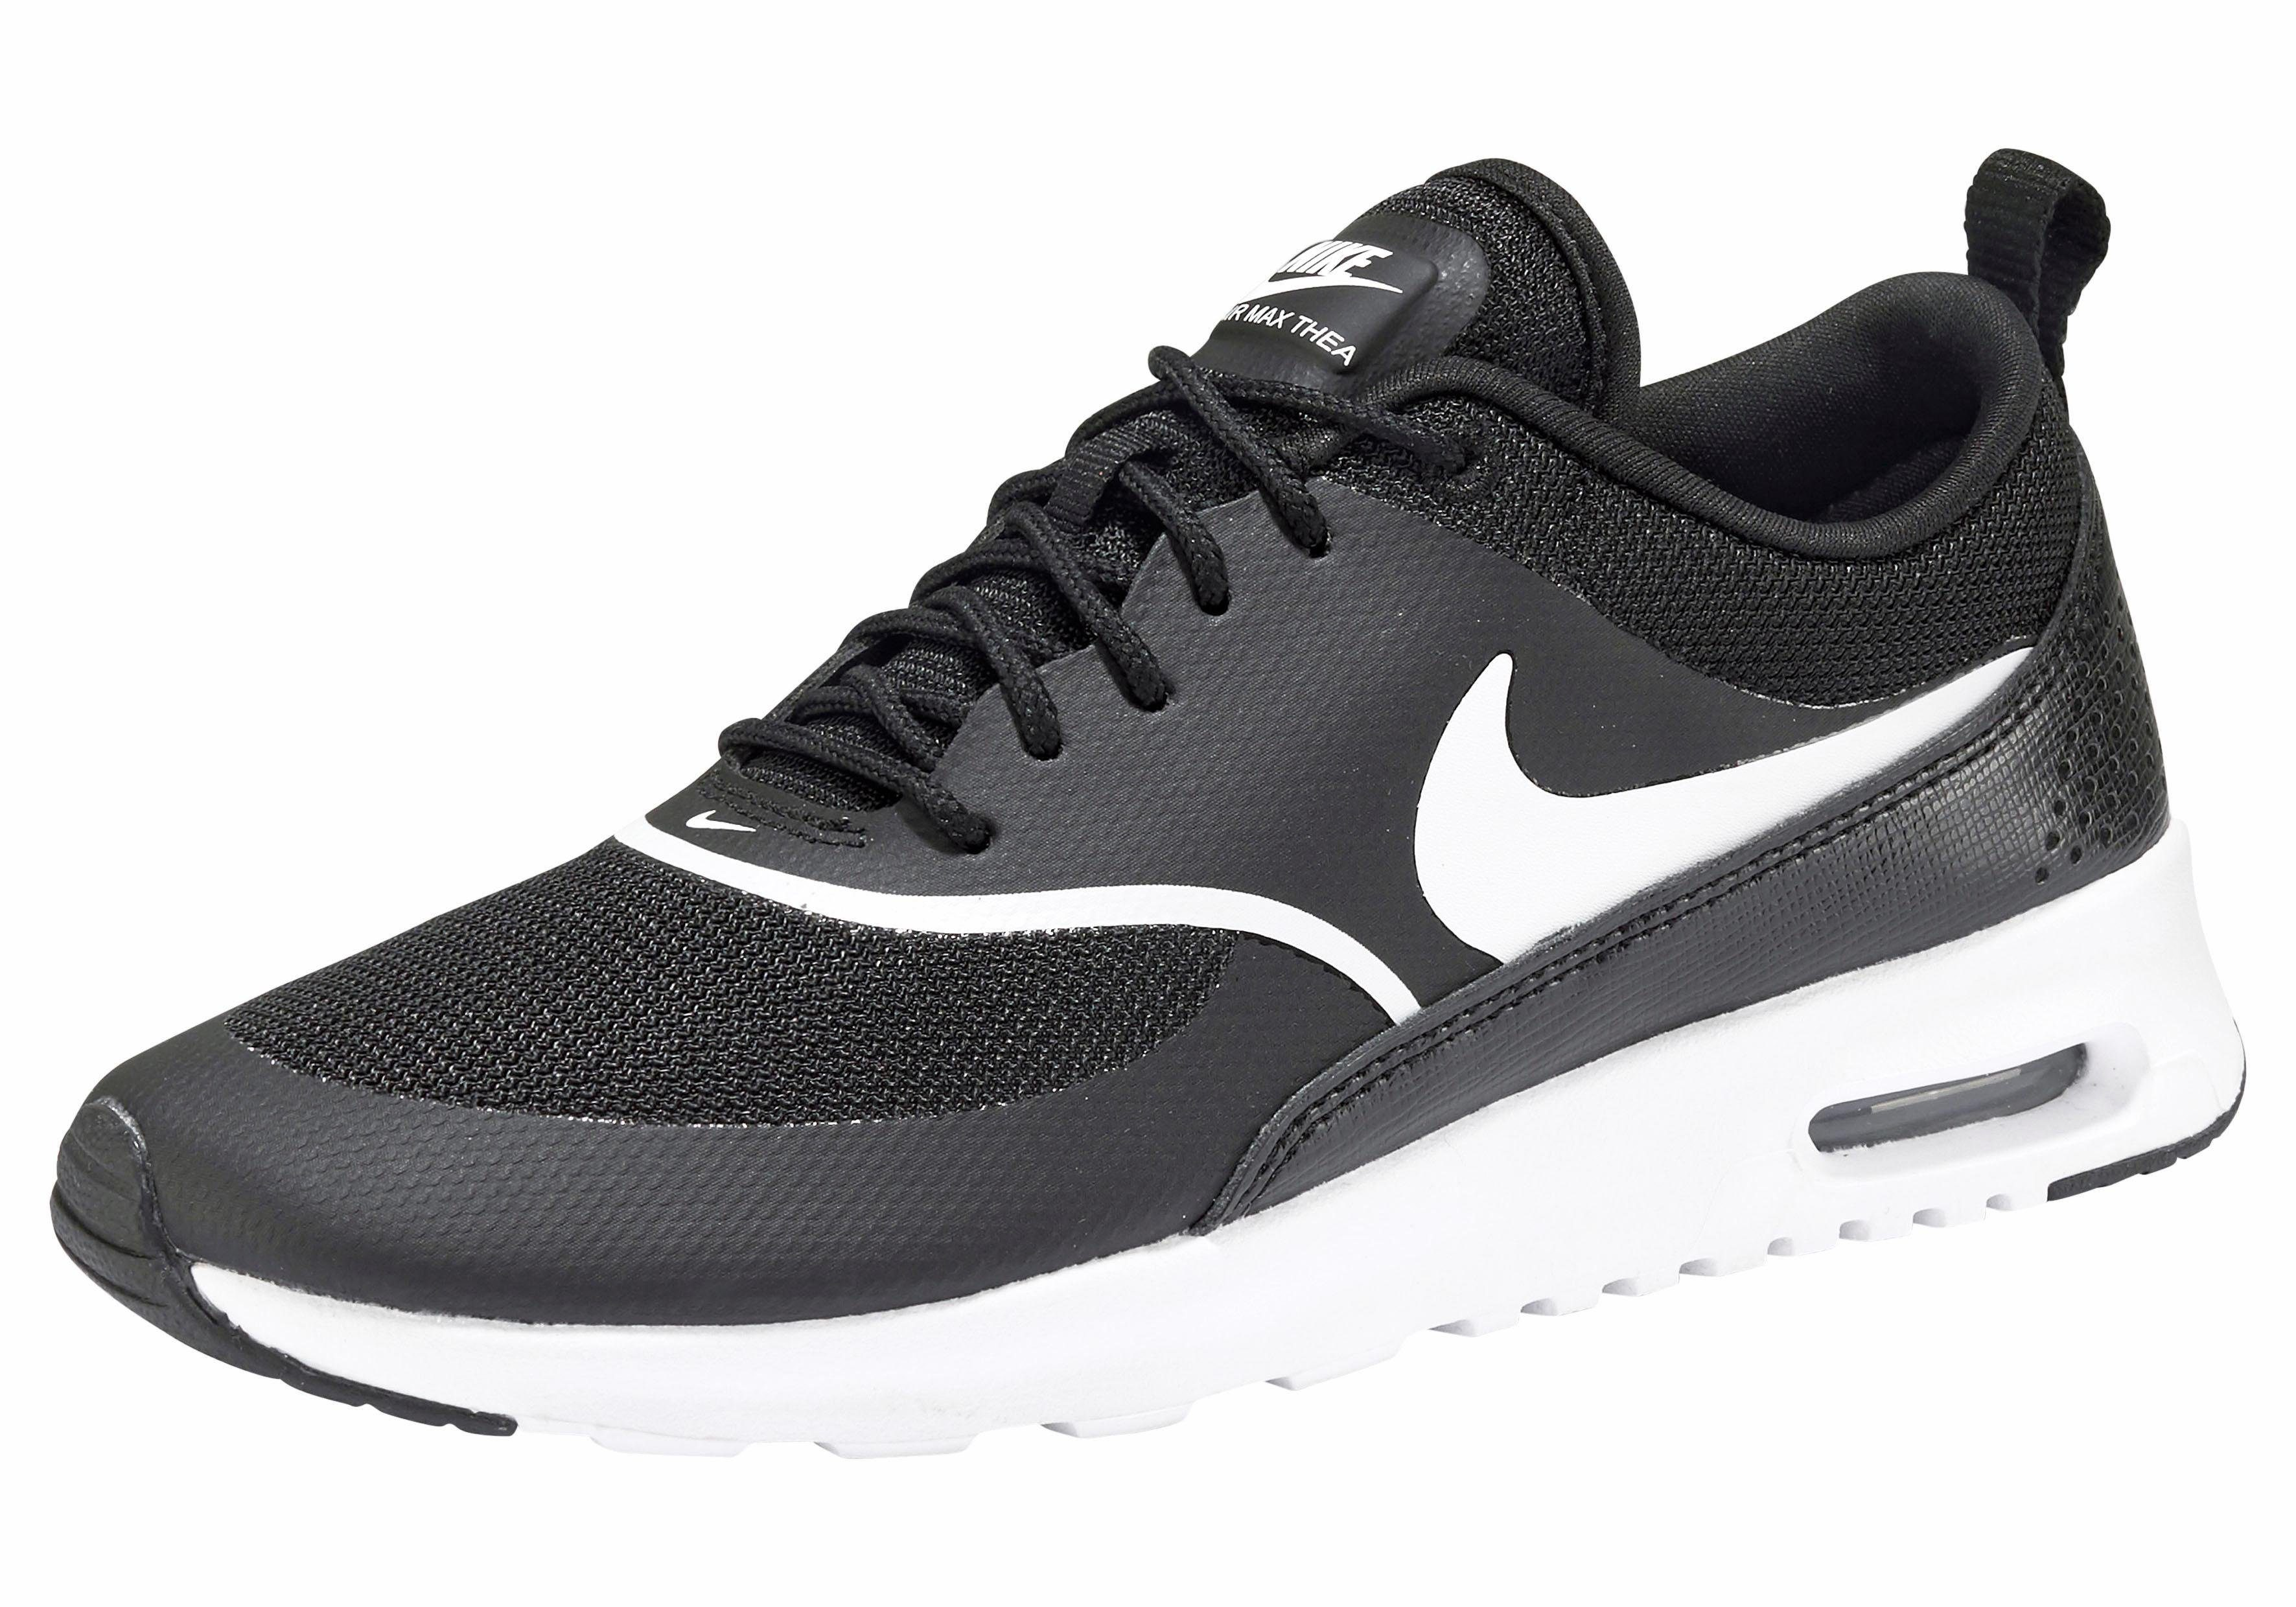 Nike Sportswear »Air Max Thea« Sneaker, Materialmix aus Synthetik und Textil online kaufen | OTTO